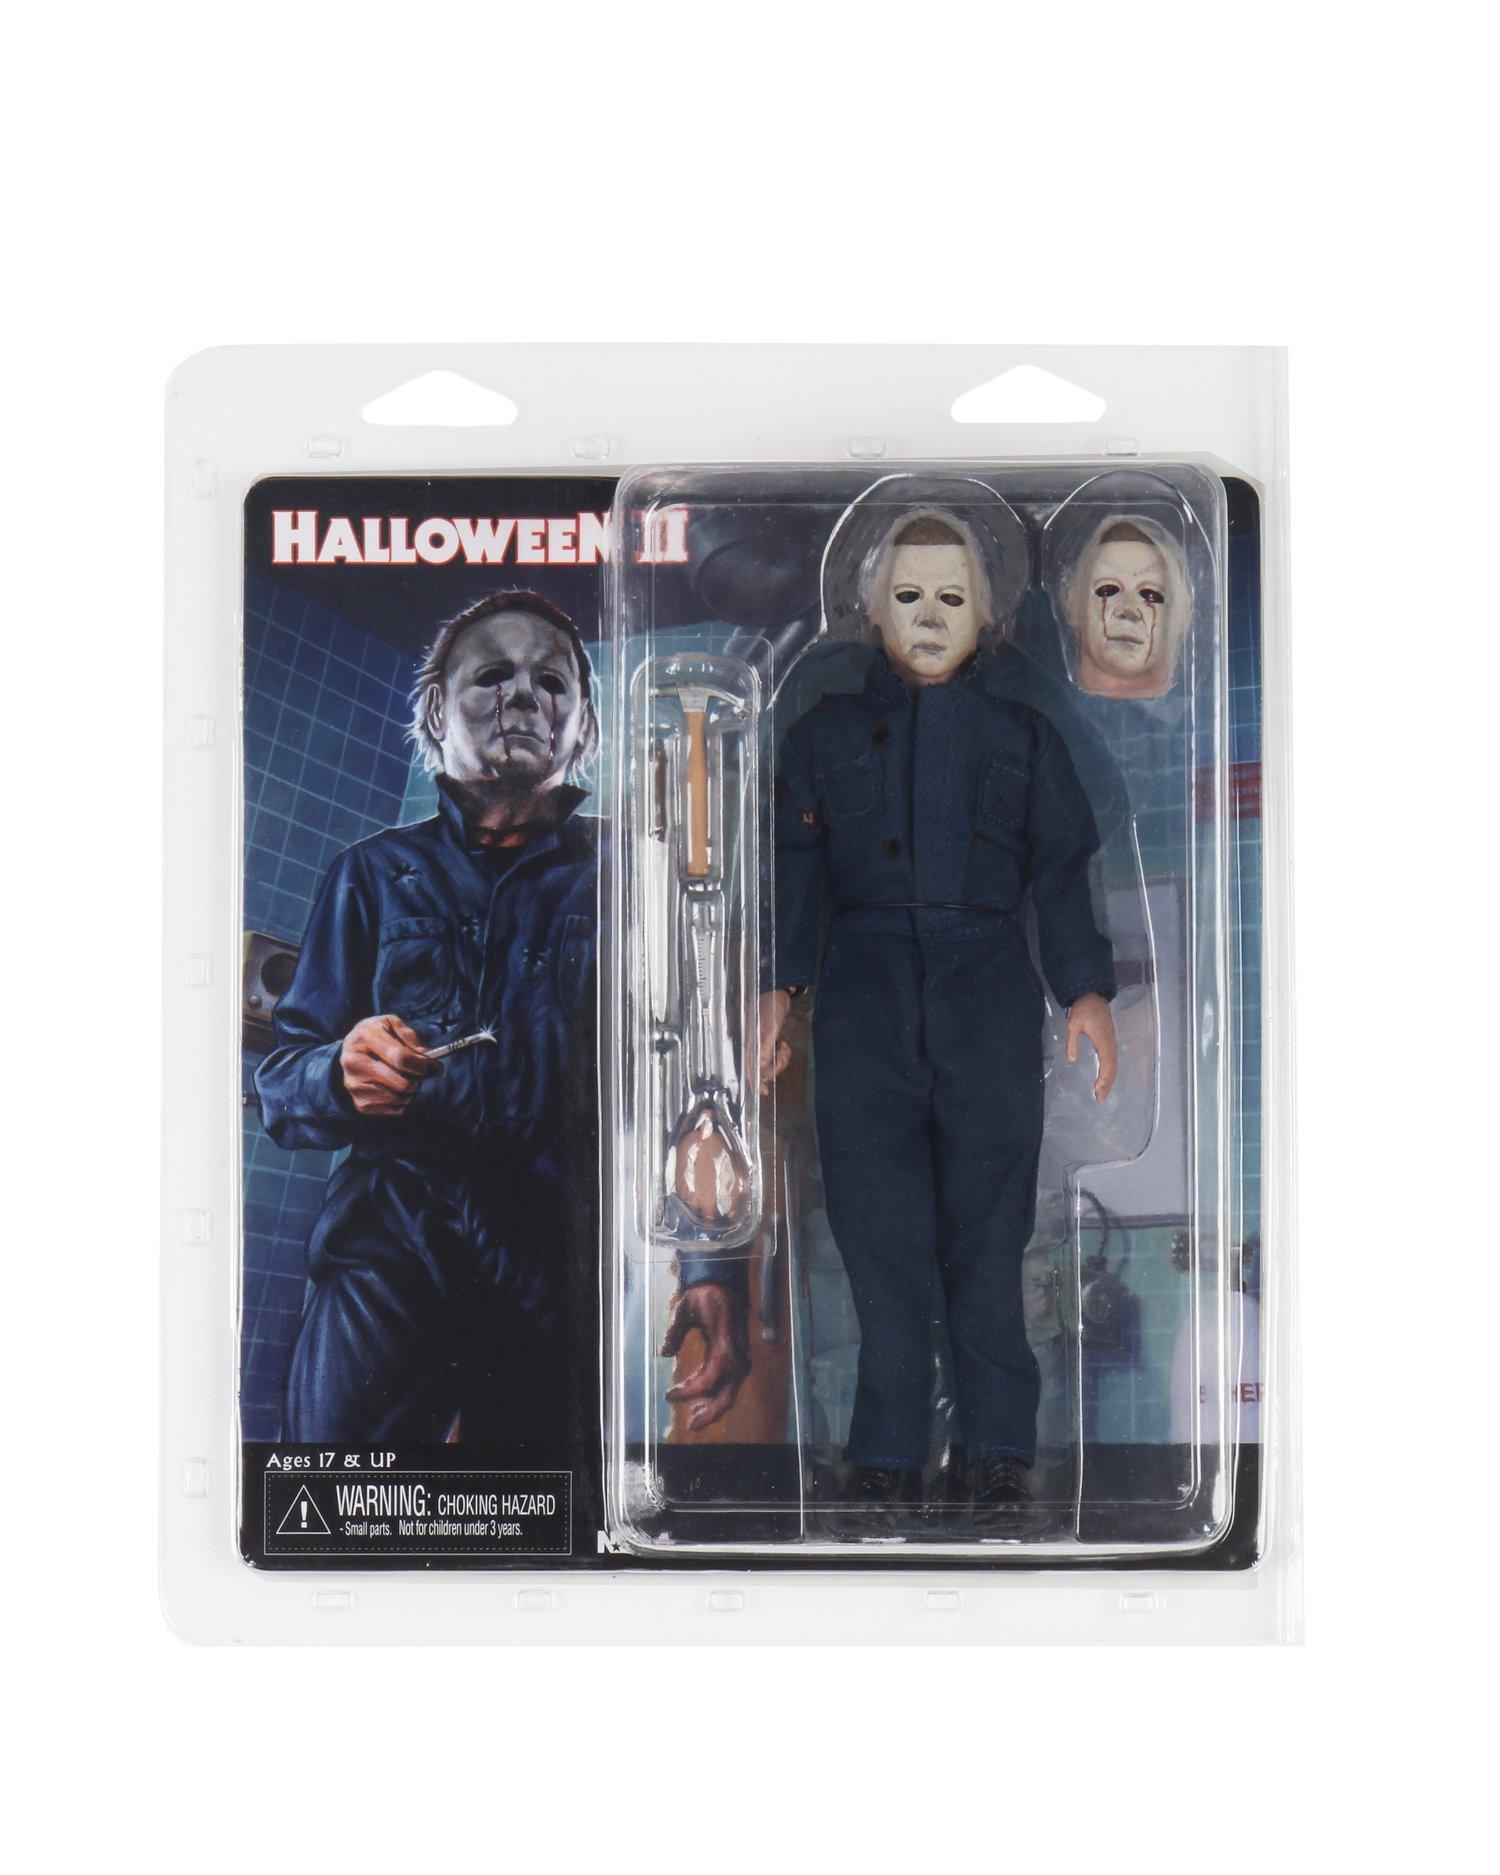 Halloween 2020 Michael Myers Action Figure NECA Toys Halloween 2 Michael Myers 8″ Clothed Figure In Packaging